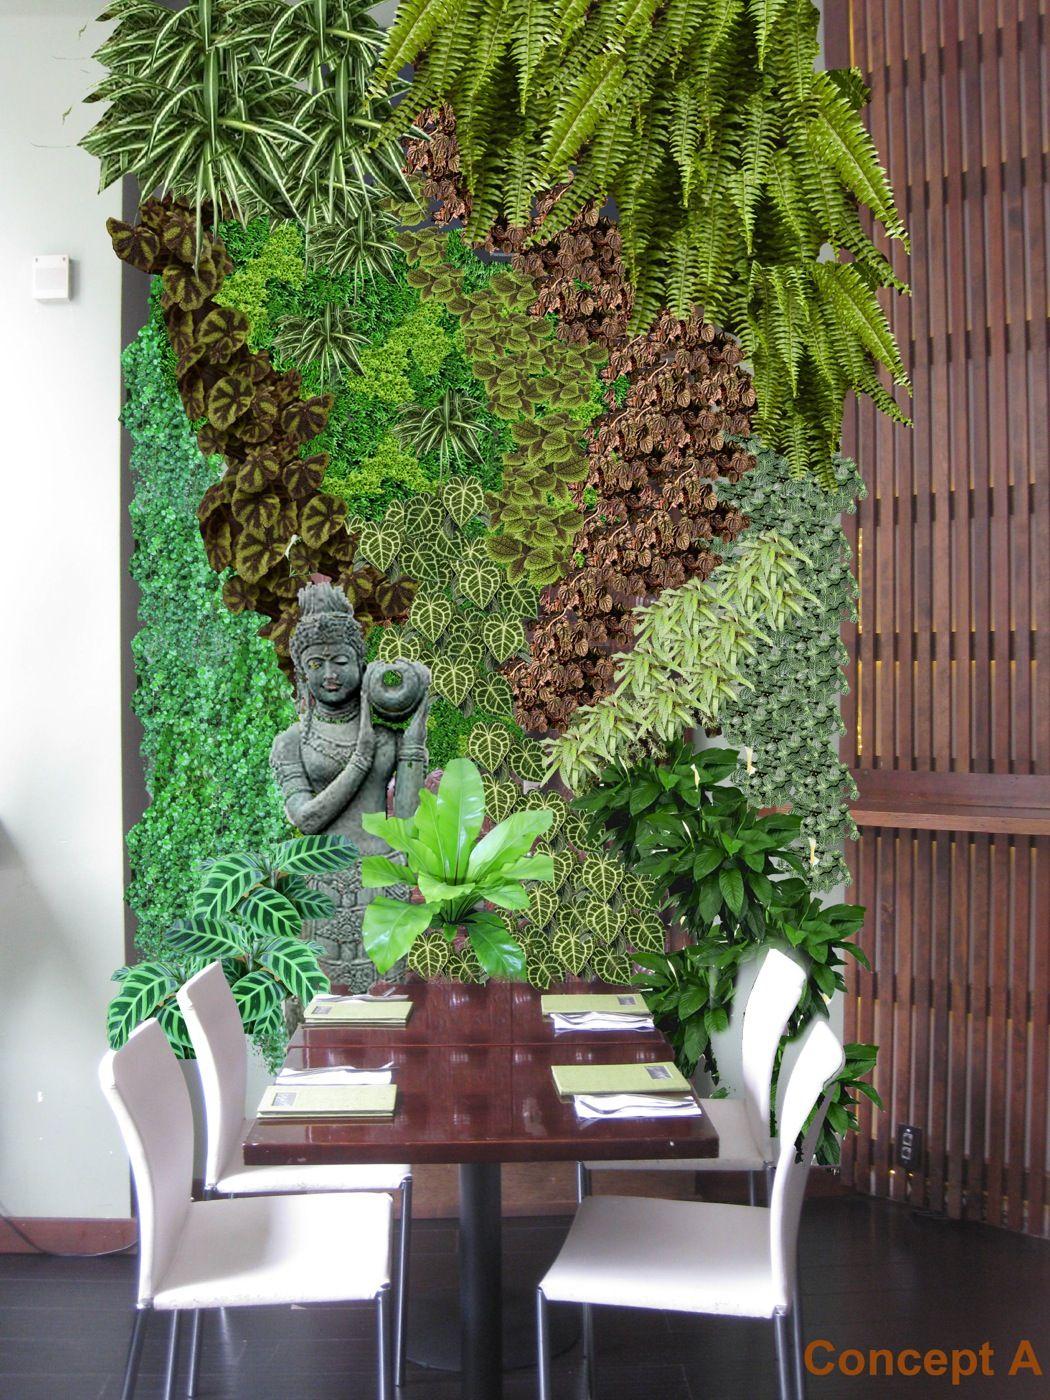 22 Amazing Vertical Garden Ideas For Your Small Yard: Vertical Garden // Habitat Horticulture